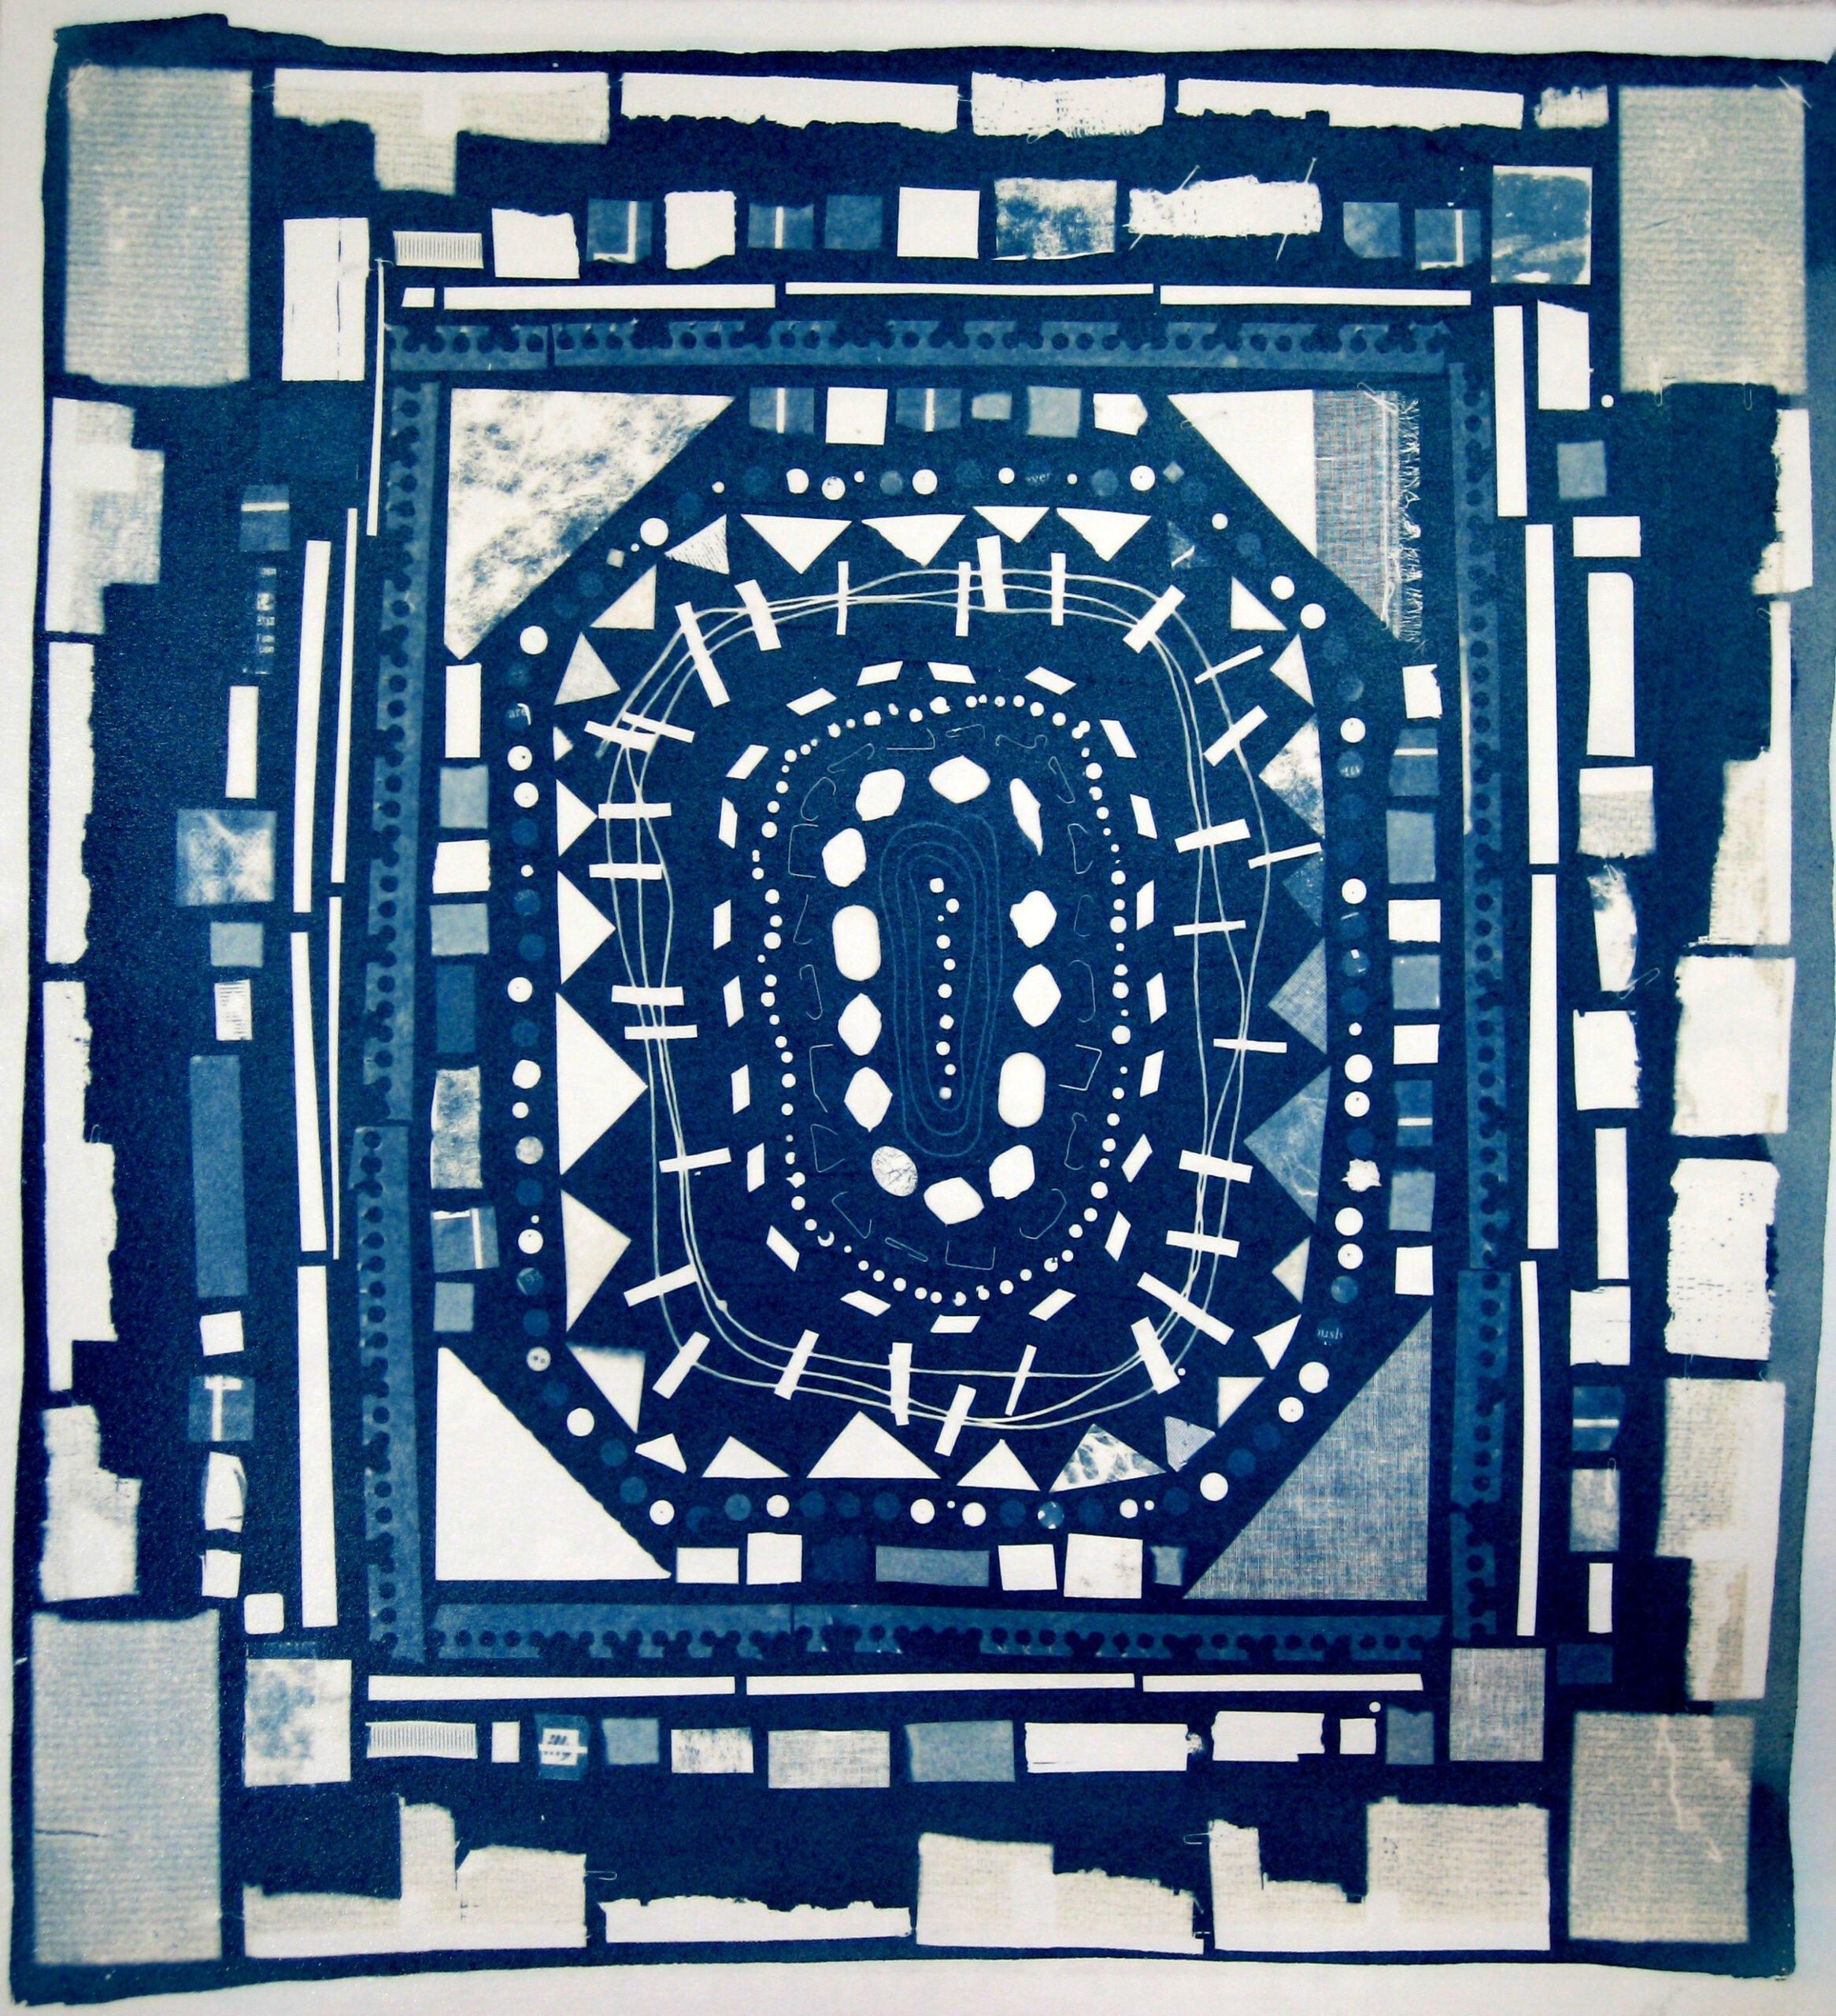 Homework Series Carpet